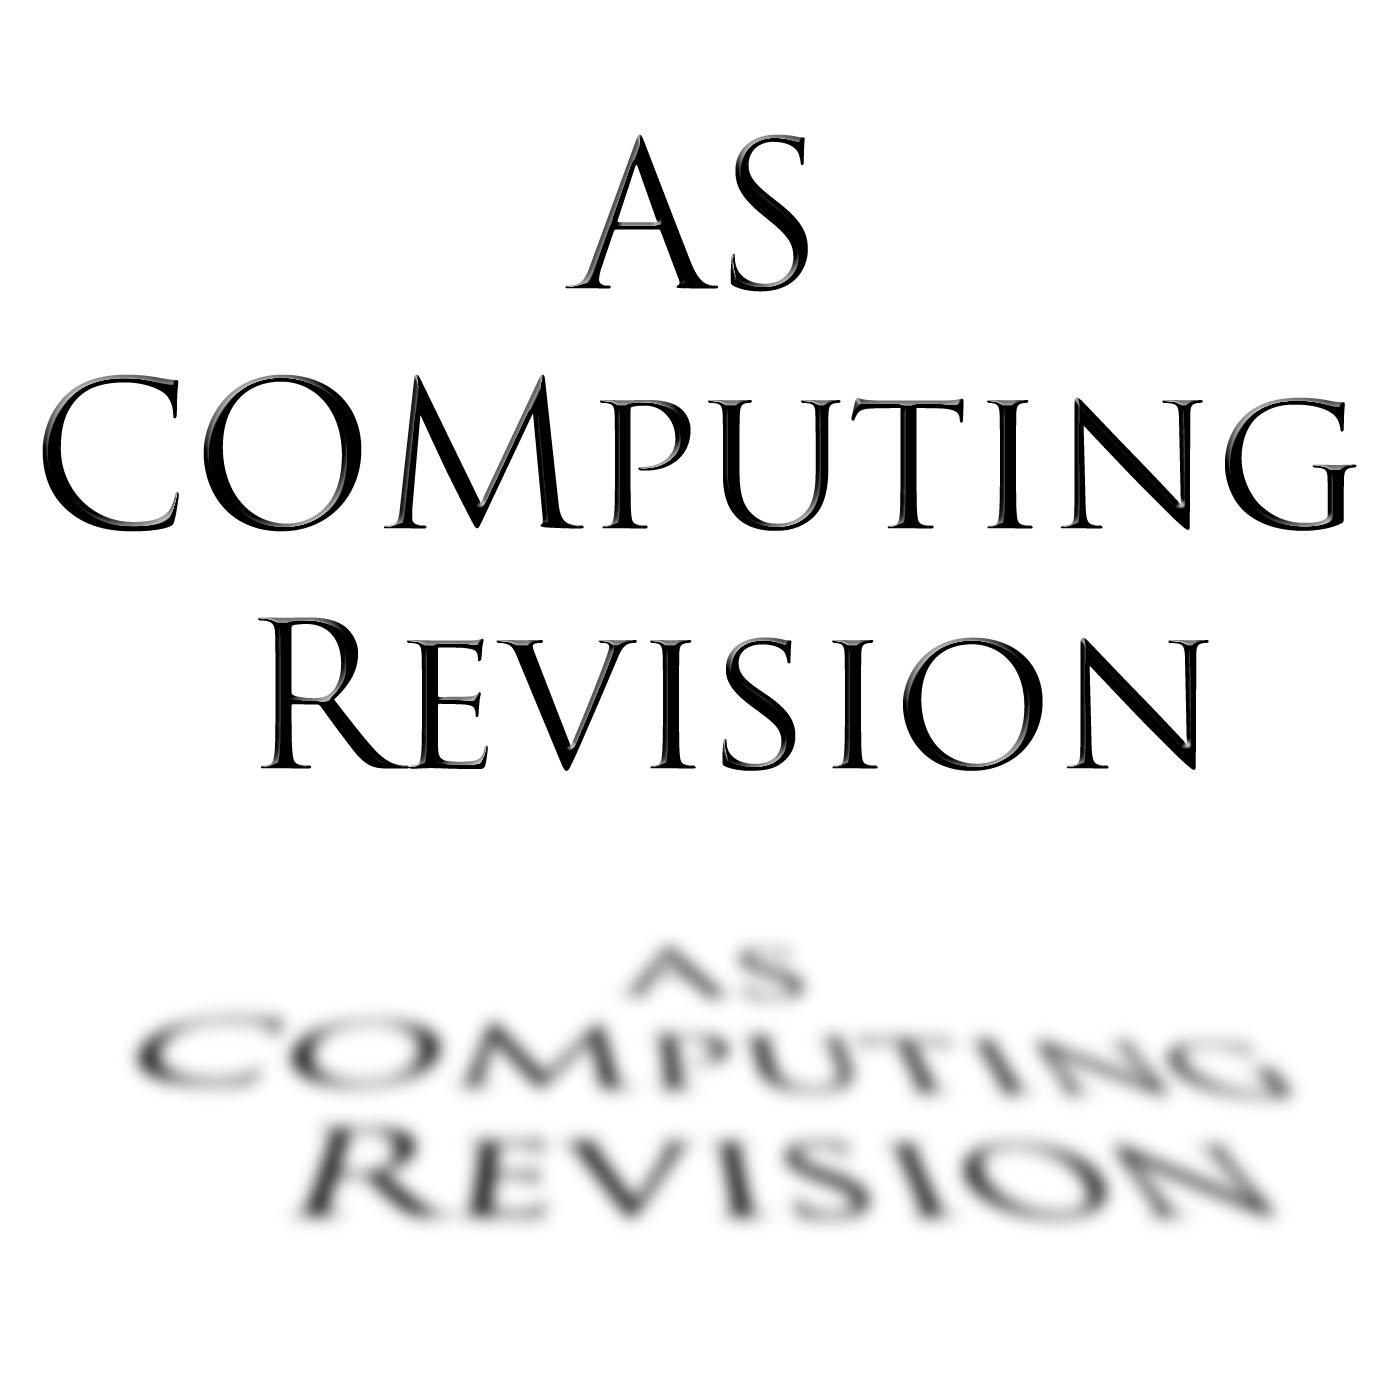 OCR A level Computing Revision (podcast) - Thomas Hudson